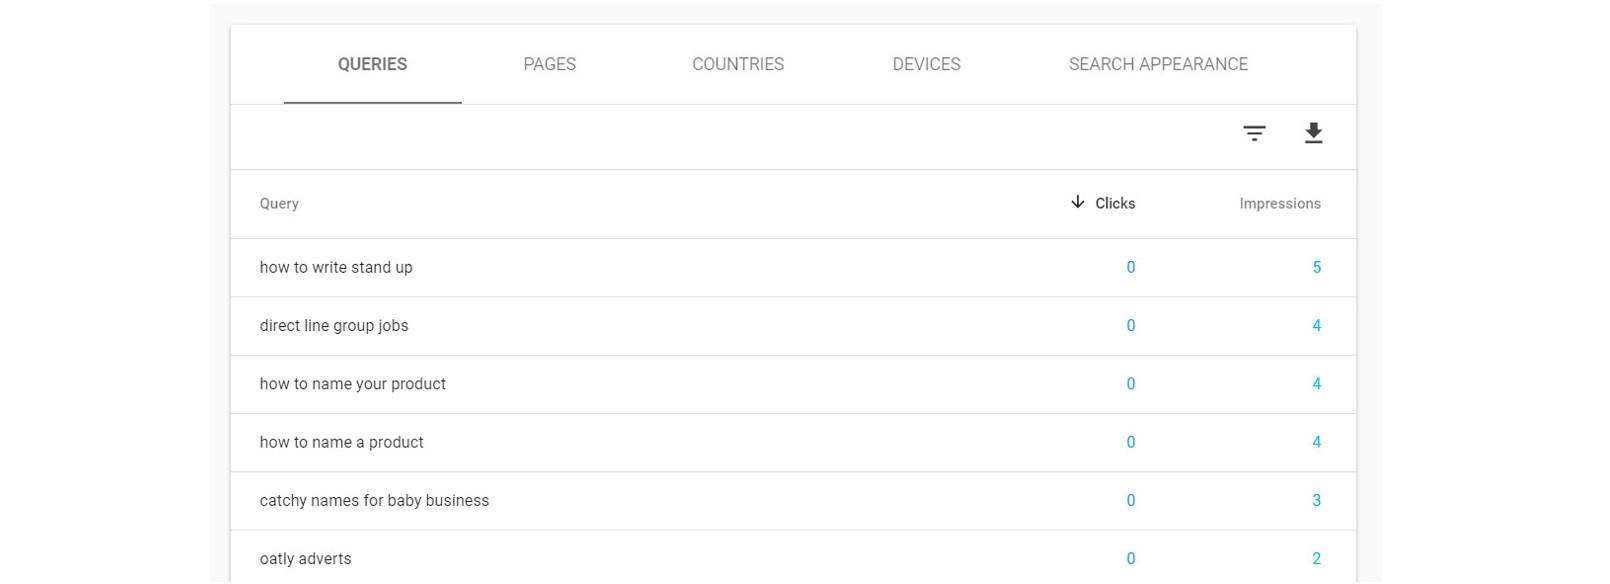 Google Search Console queries